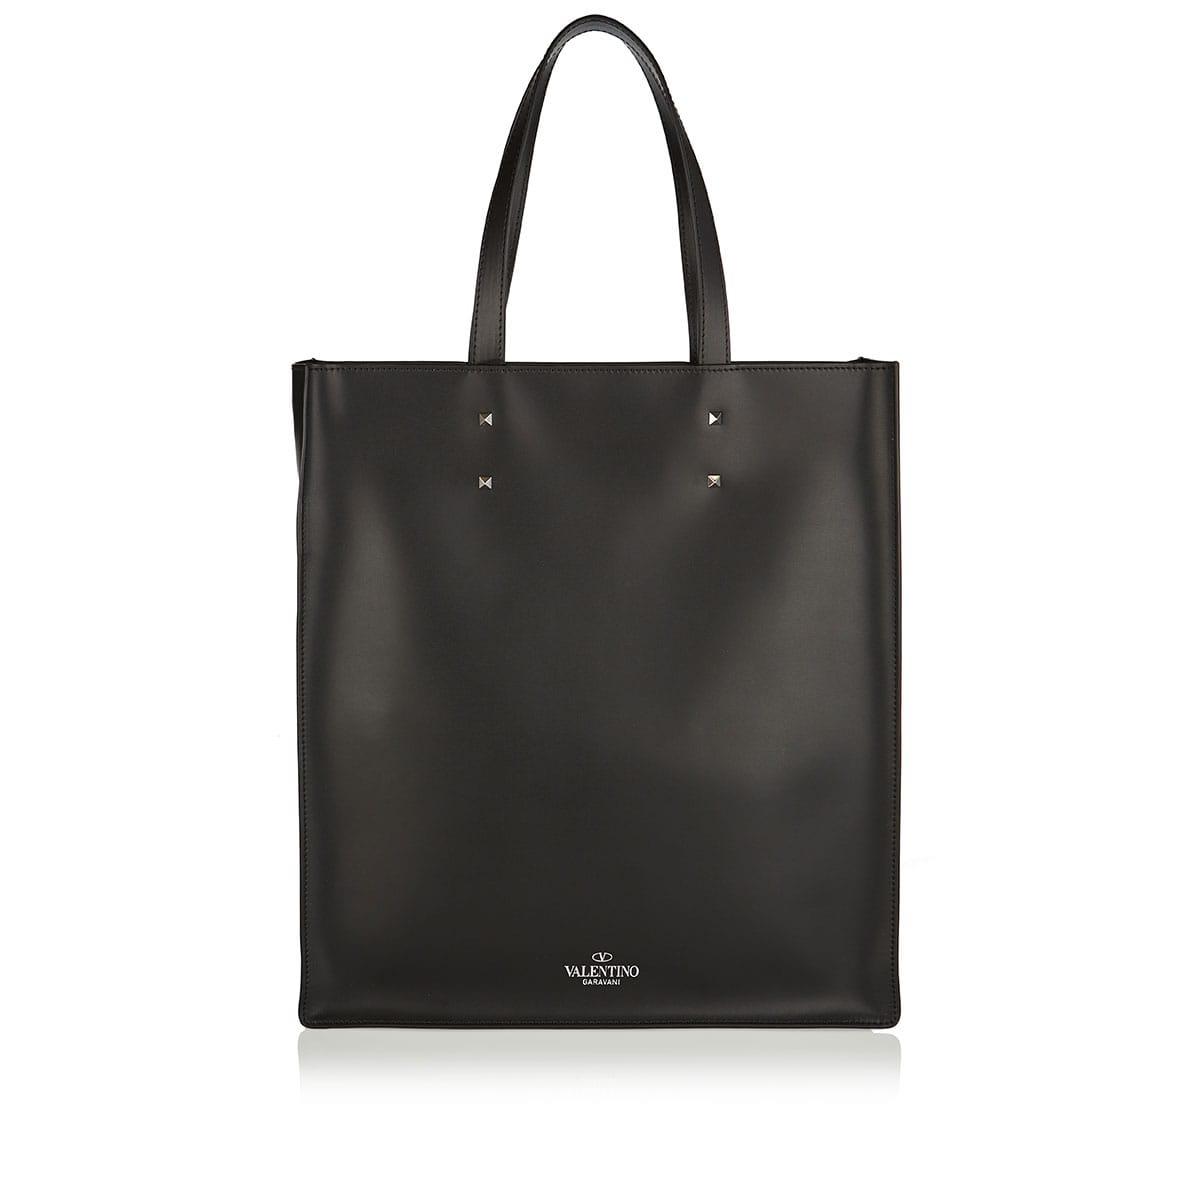 VLTN leather tote